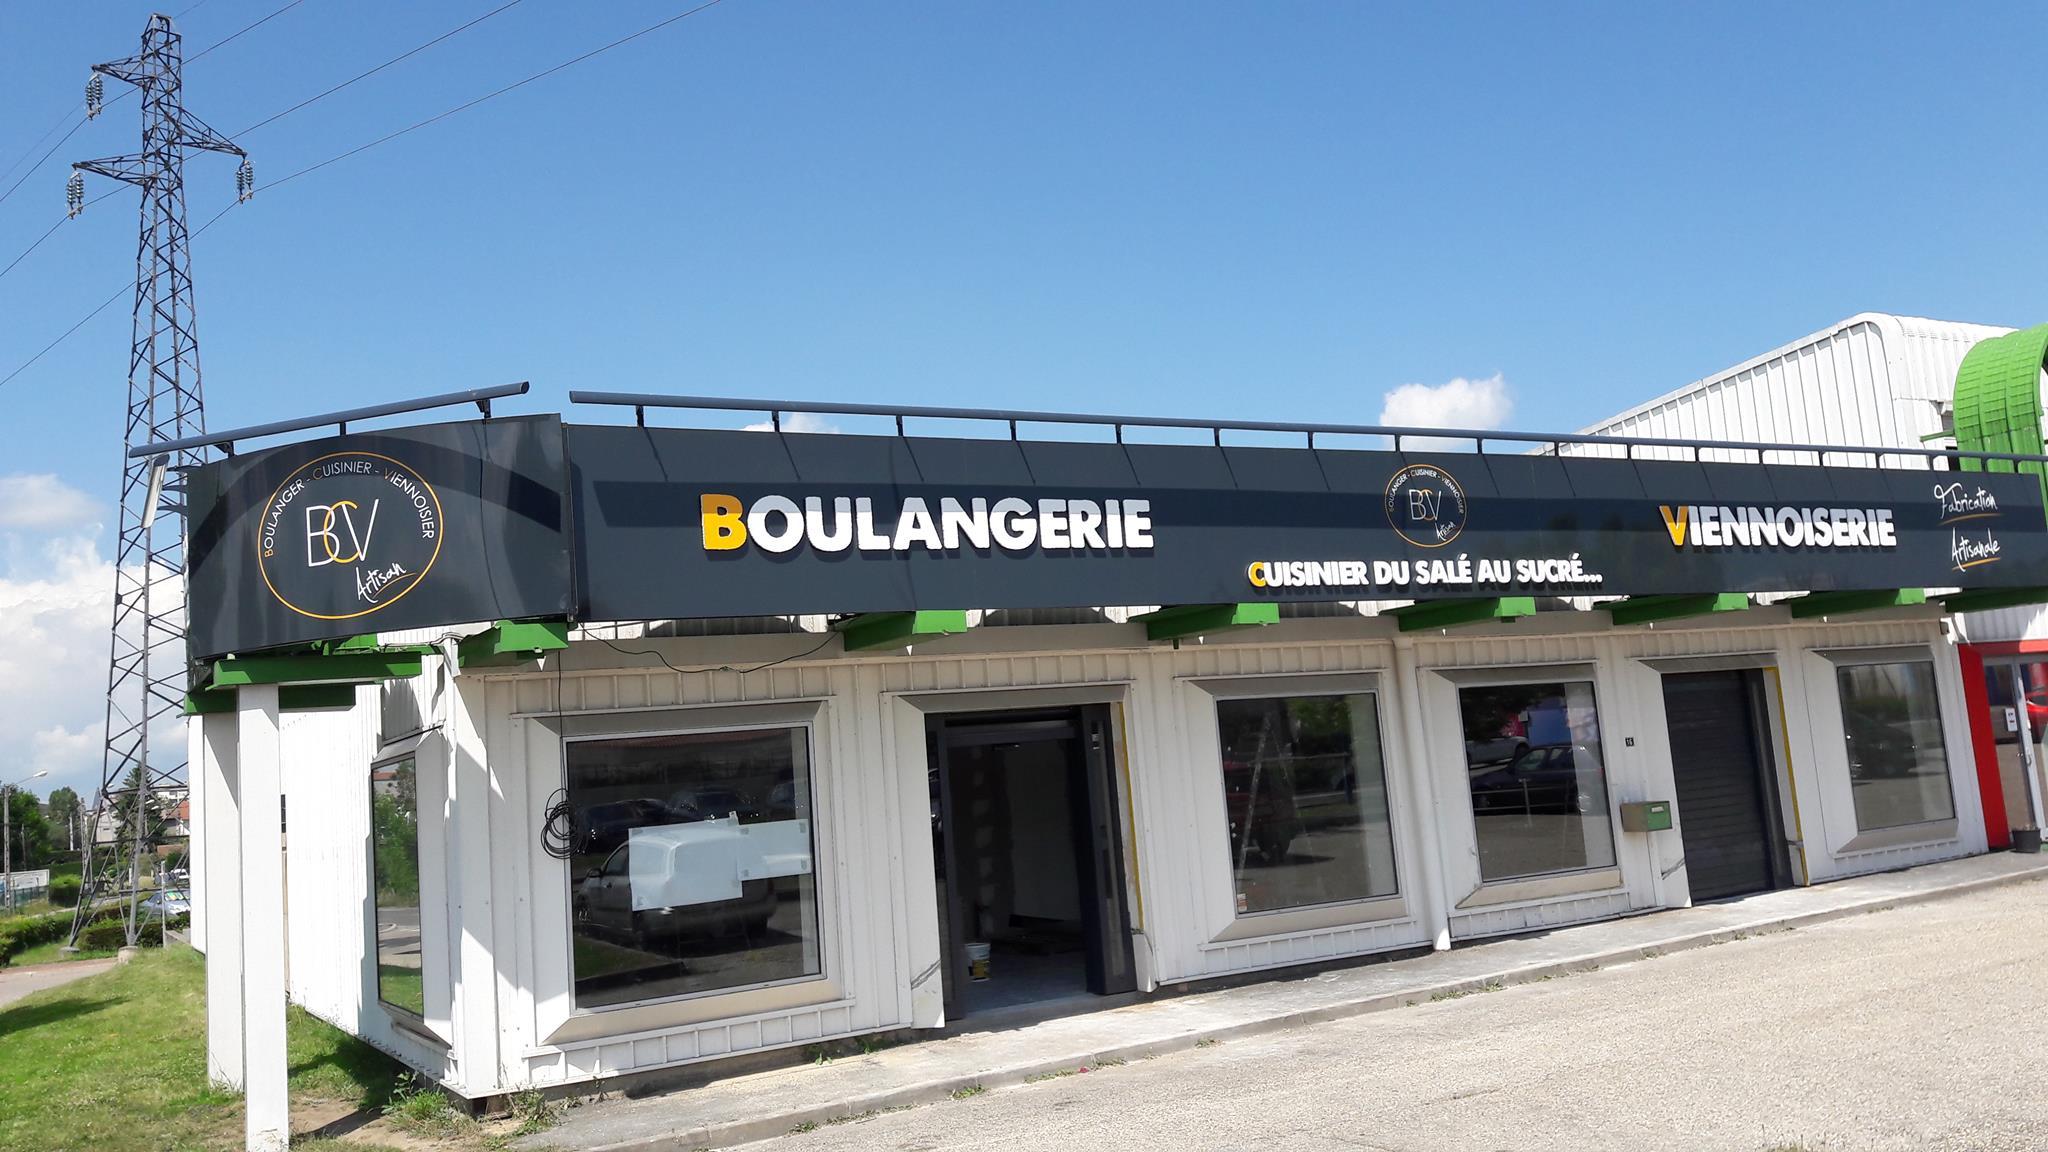 Boulangerie du Moulin Gillier façade